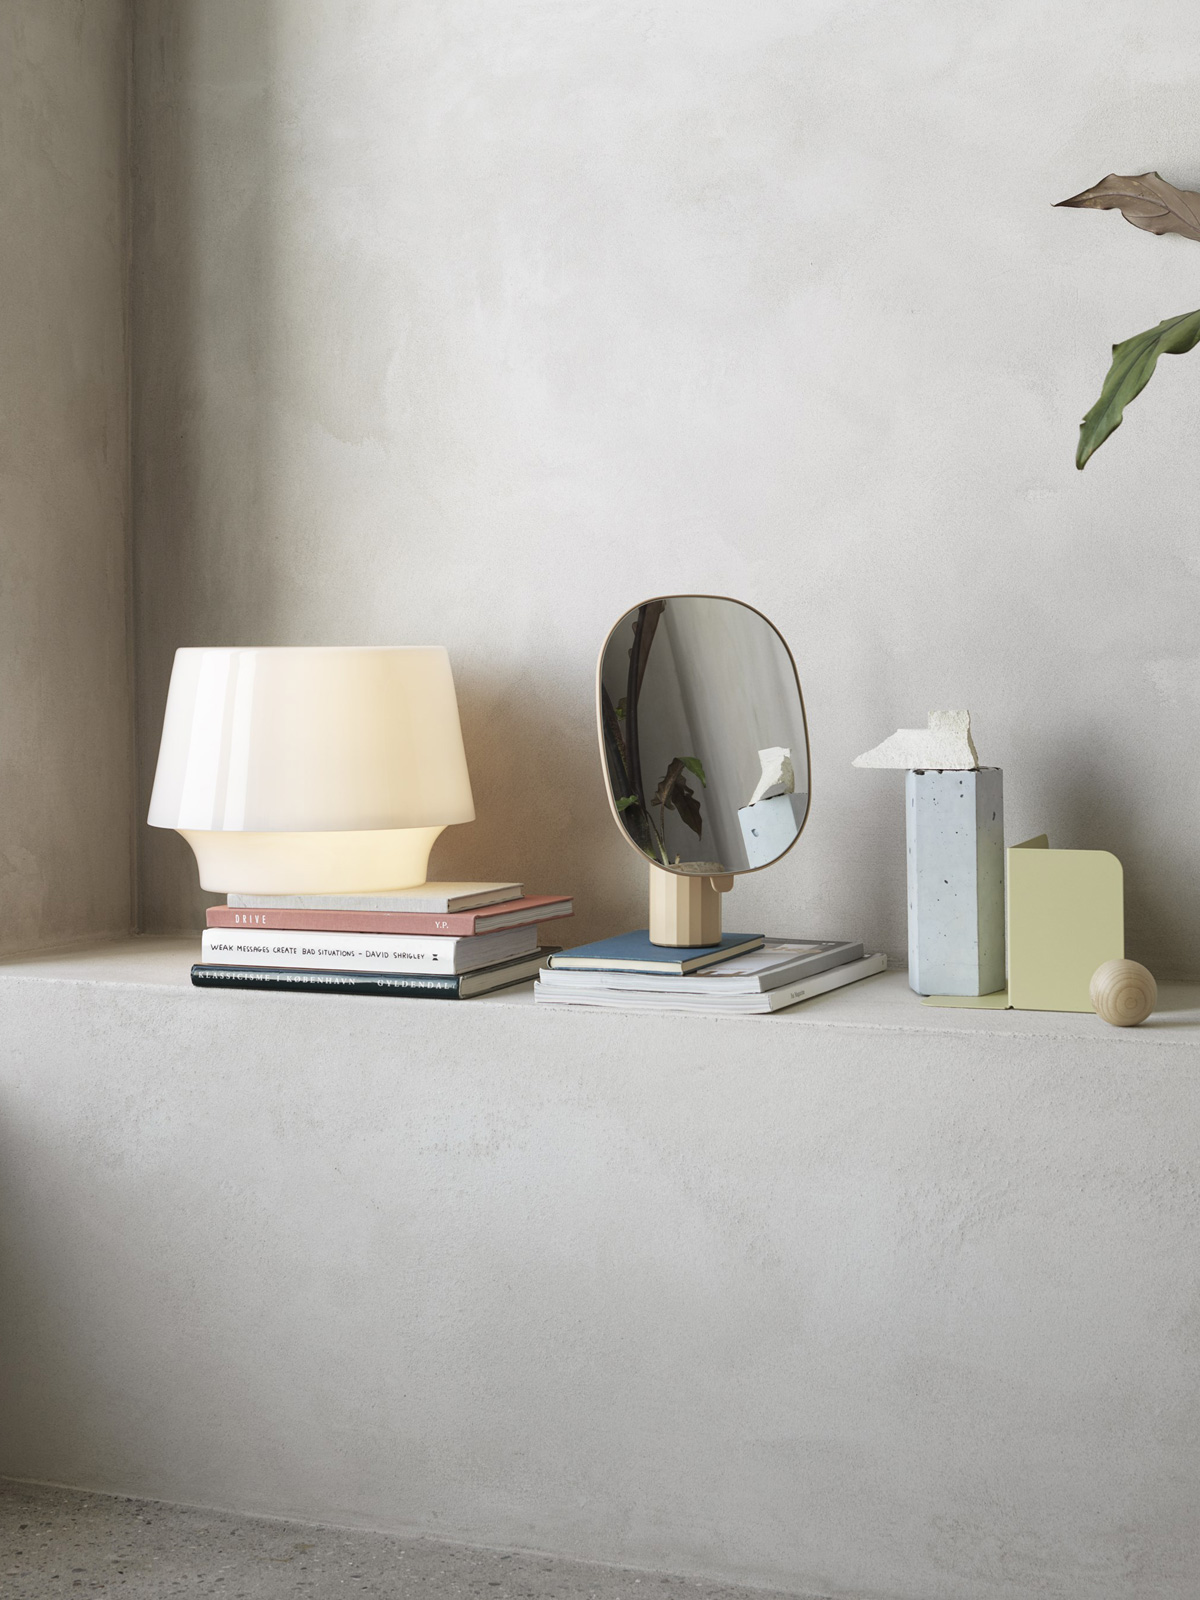 DesignOrt Blog: Tischlampe Cosy in White Muuto #skandinavisch #design #lampe